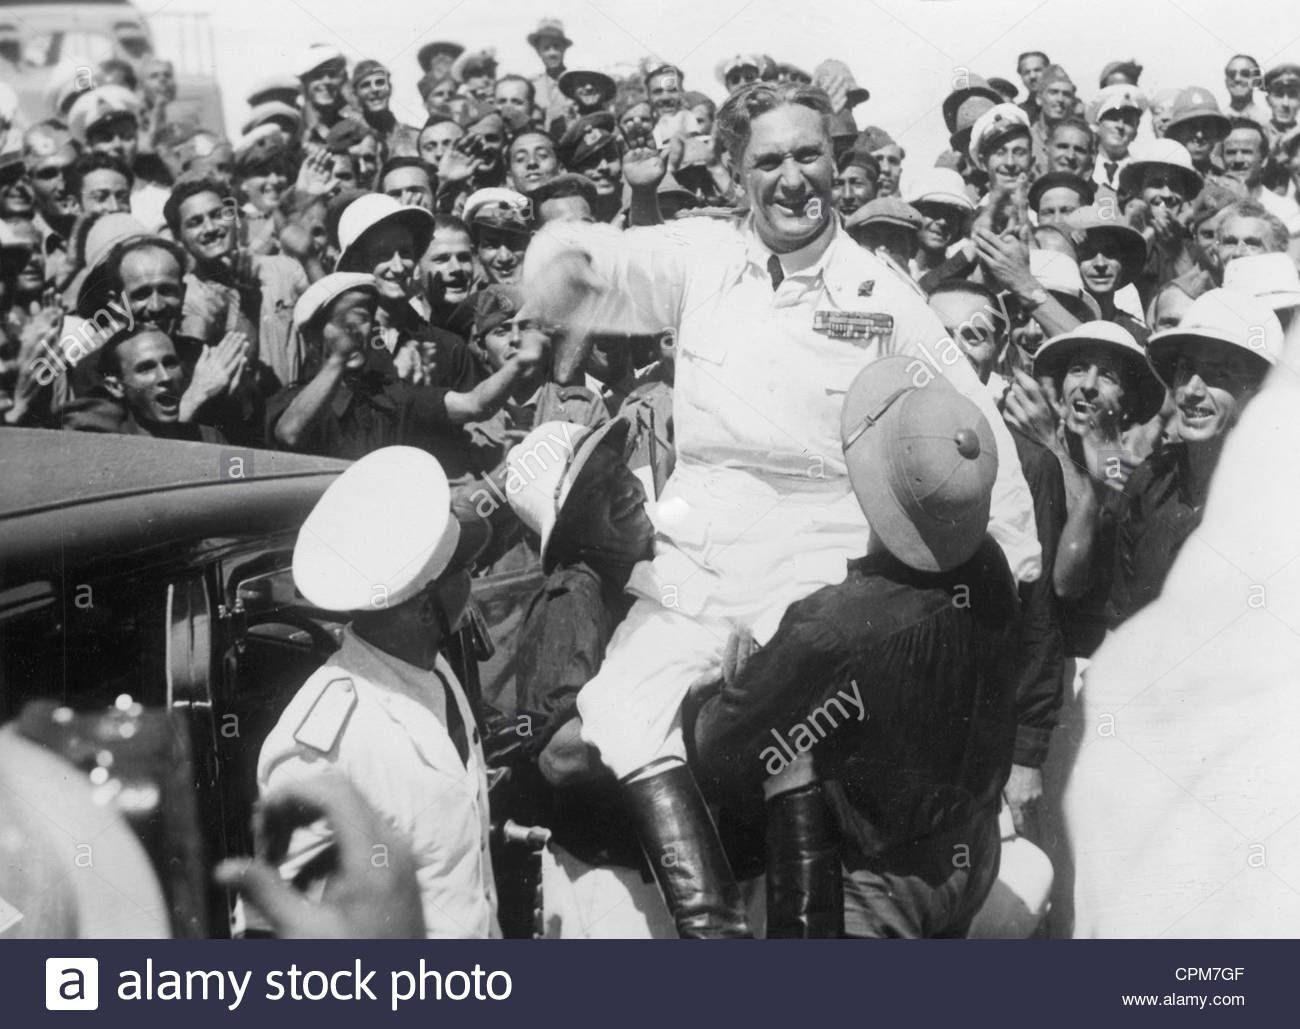 General Rodolfo Graziani Visits Italian Colonists In Abyssinia 1937 Colonial History History Italian Empire